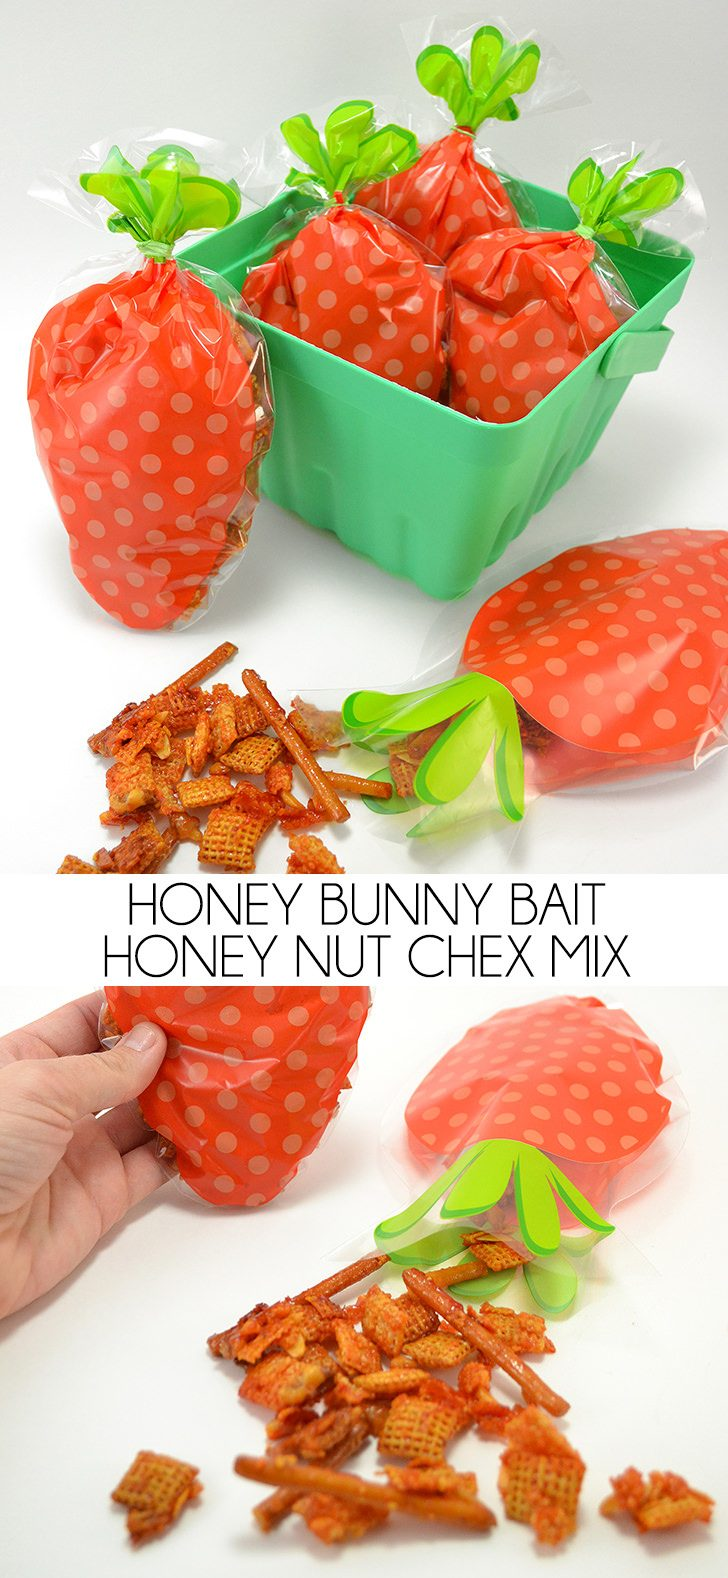 Honey Bunny Bait – Honey Nut Chex Mix Recipe